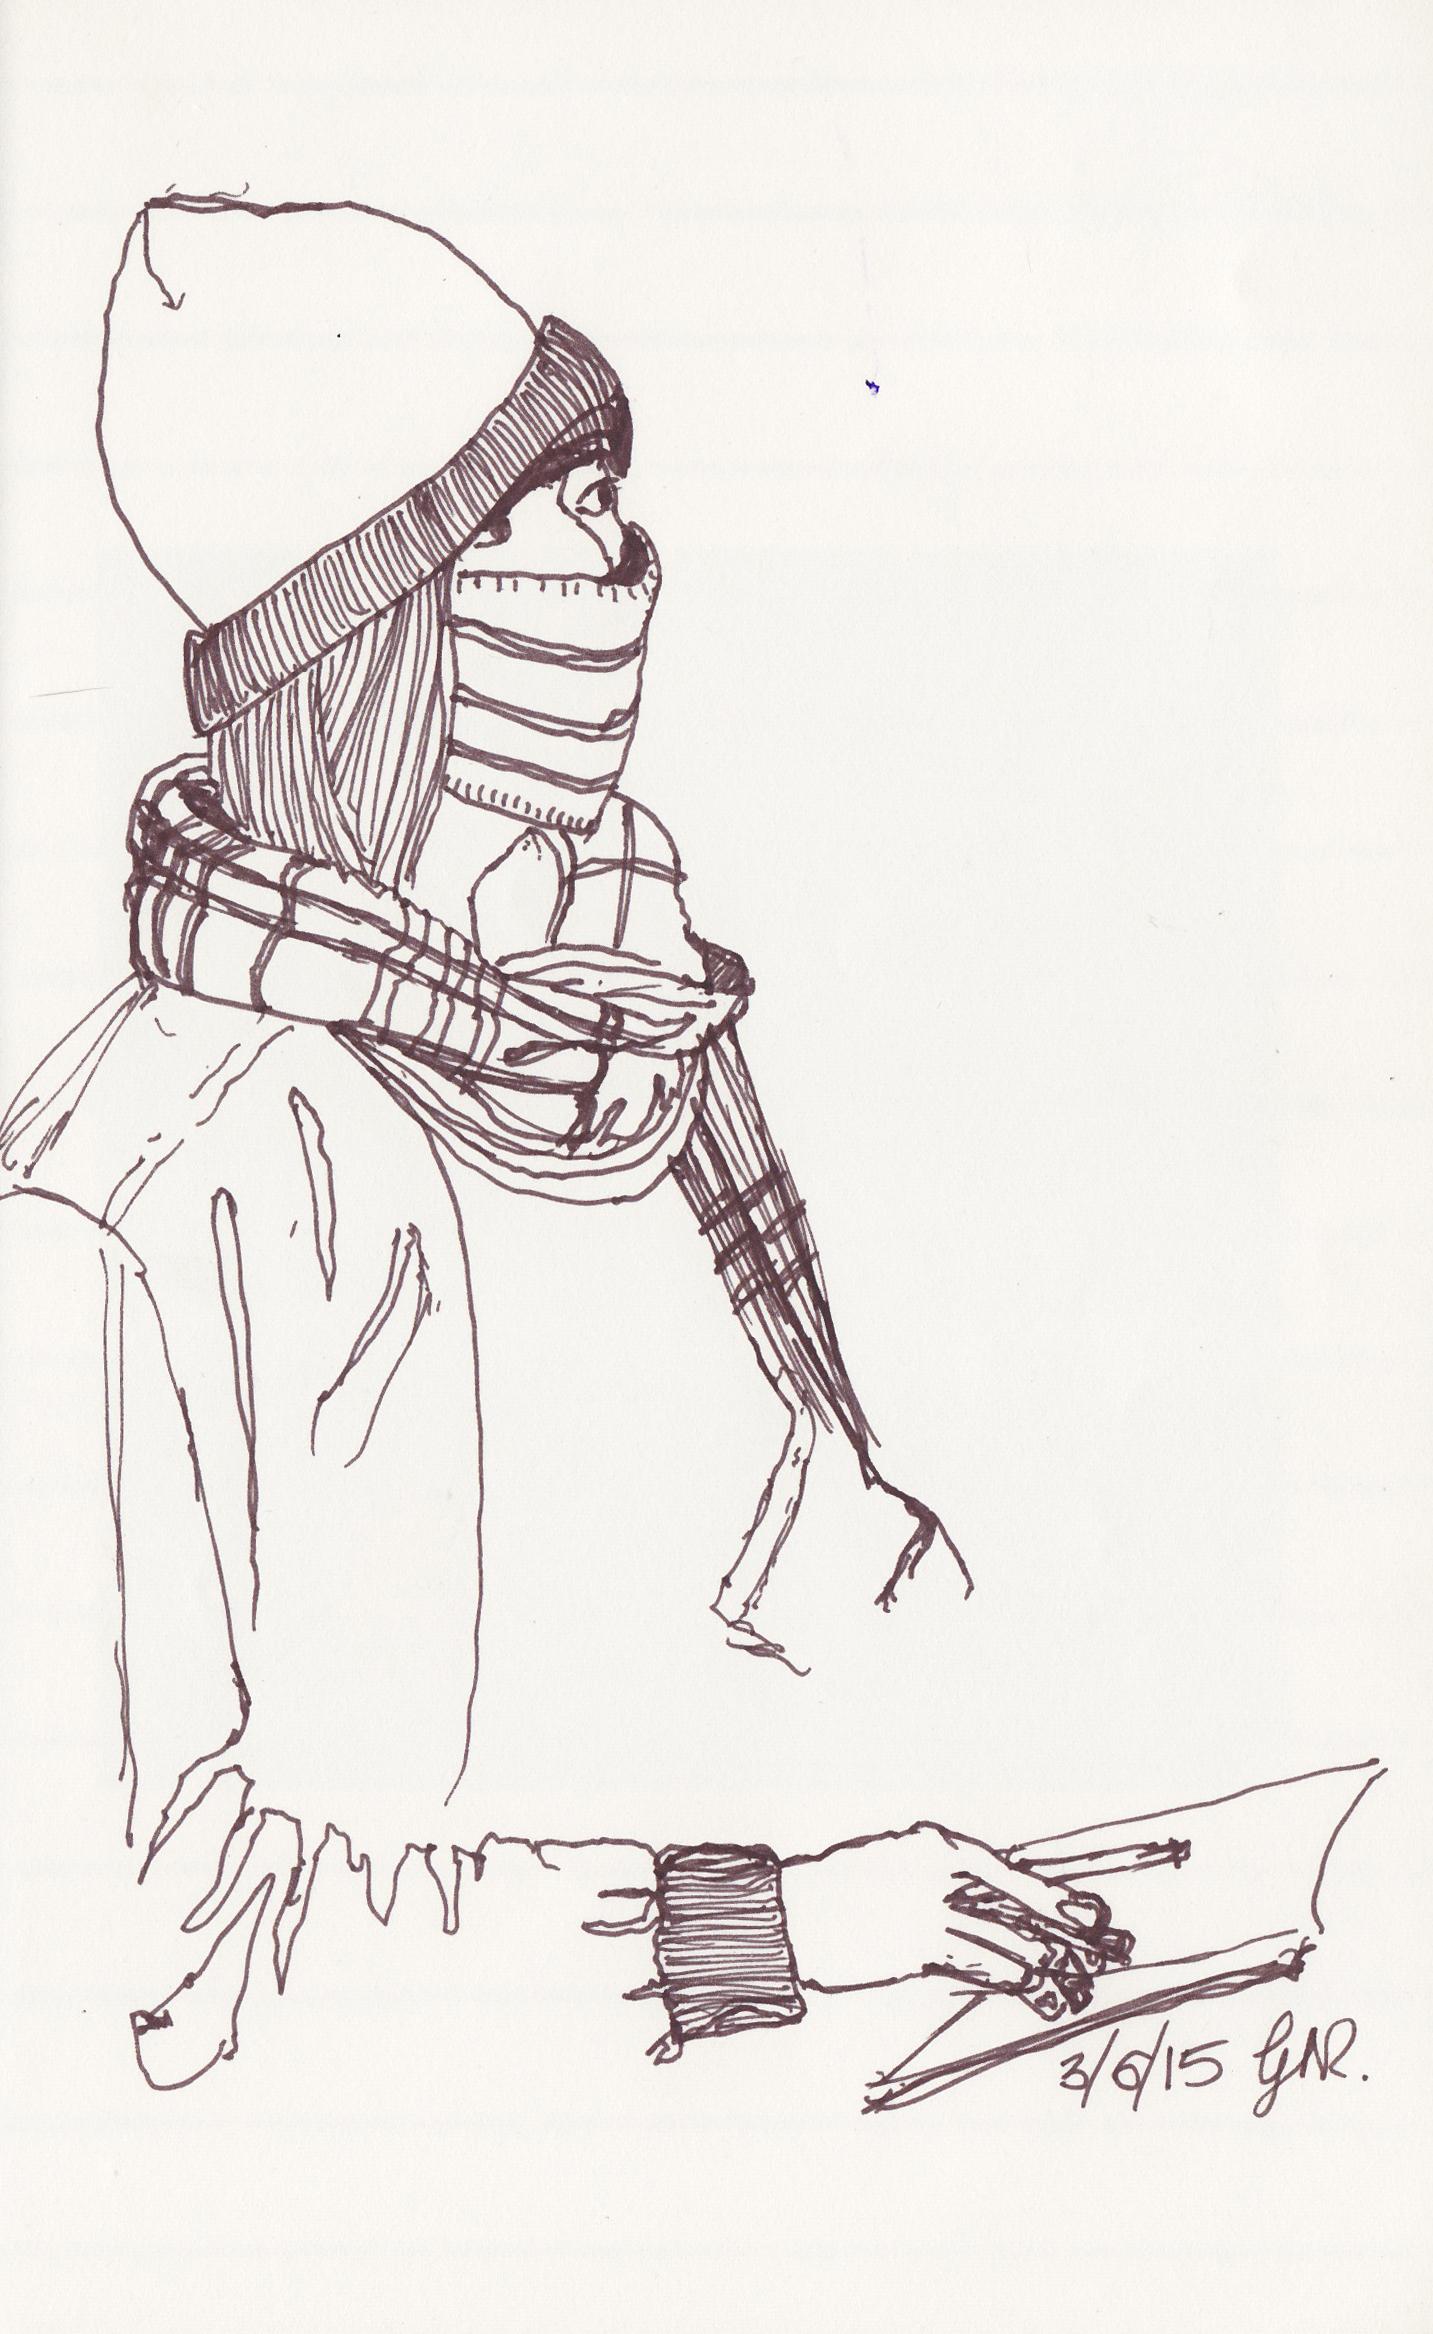 scarfedfigure.jpg